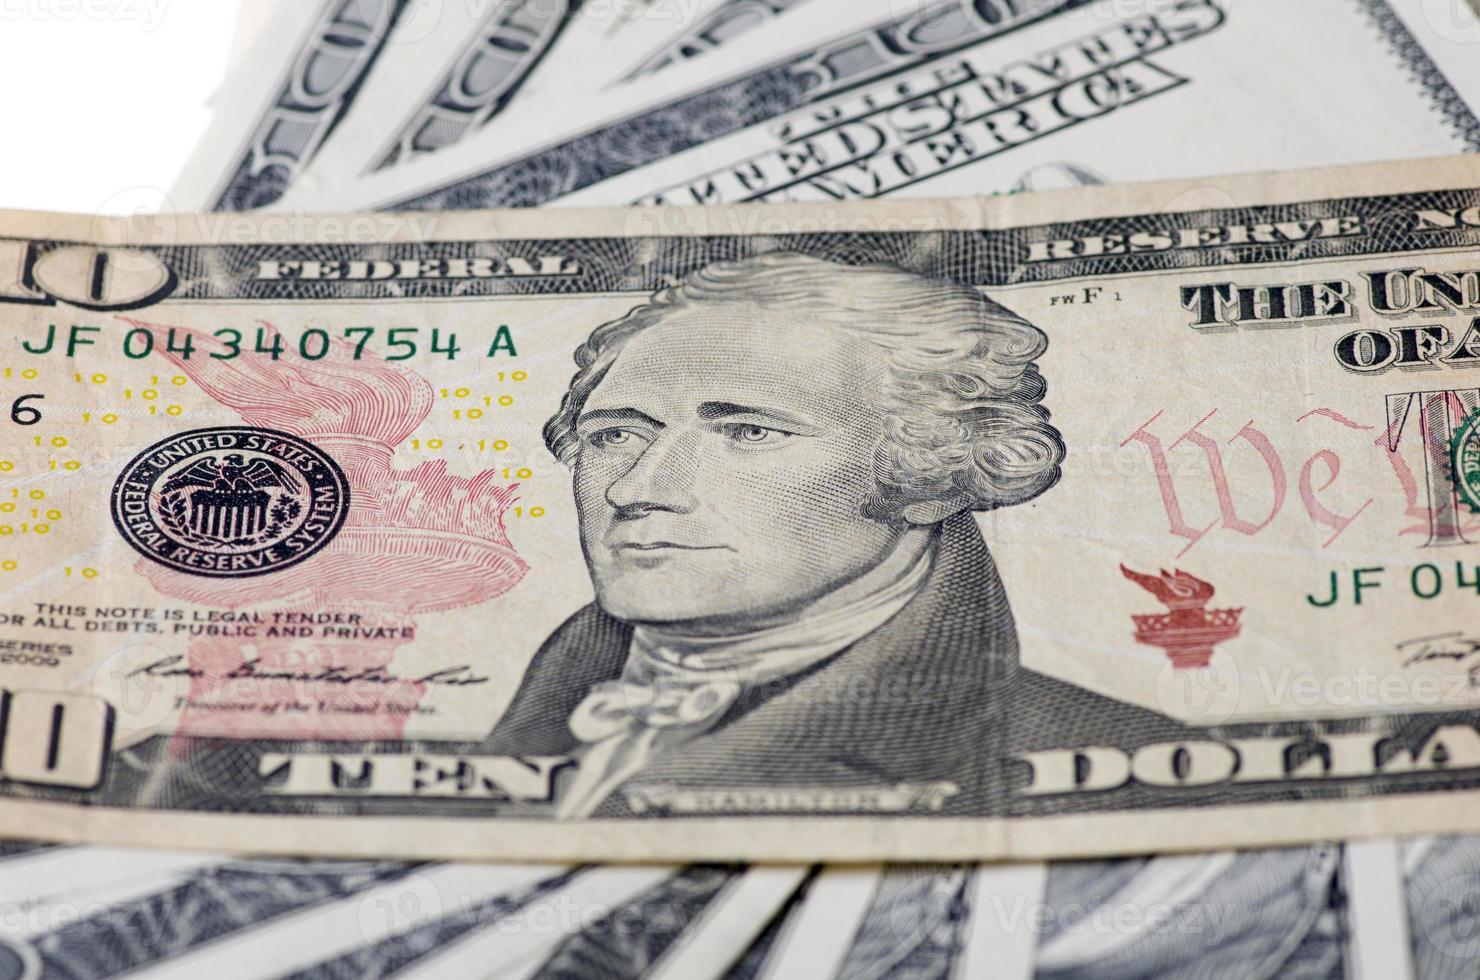 dieci dollari negli Stati Uniti d'America foto